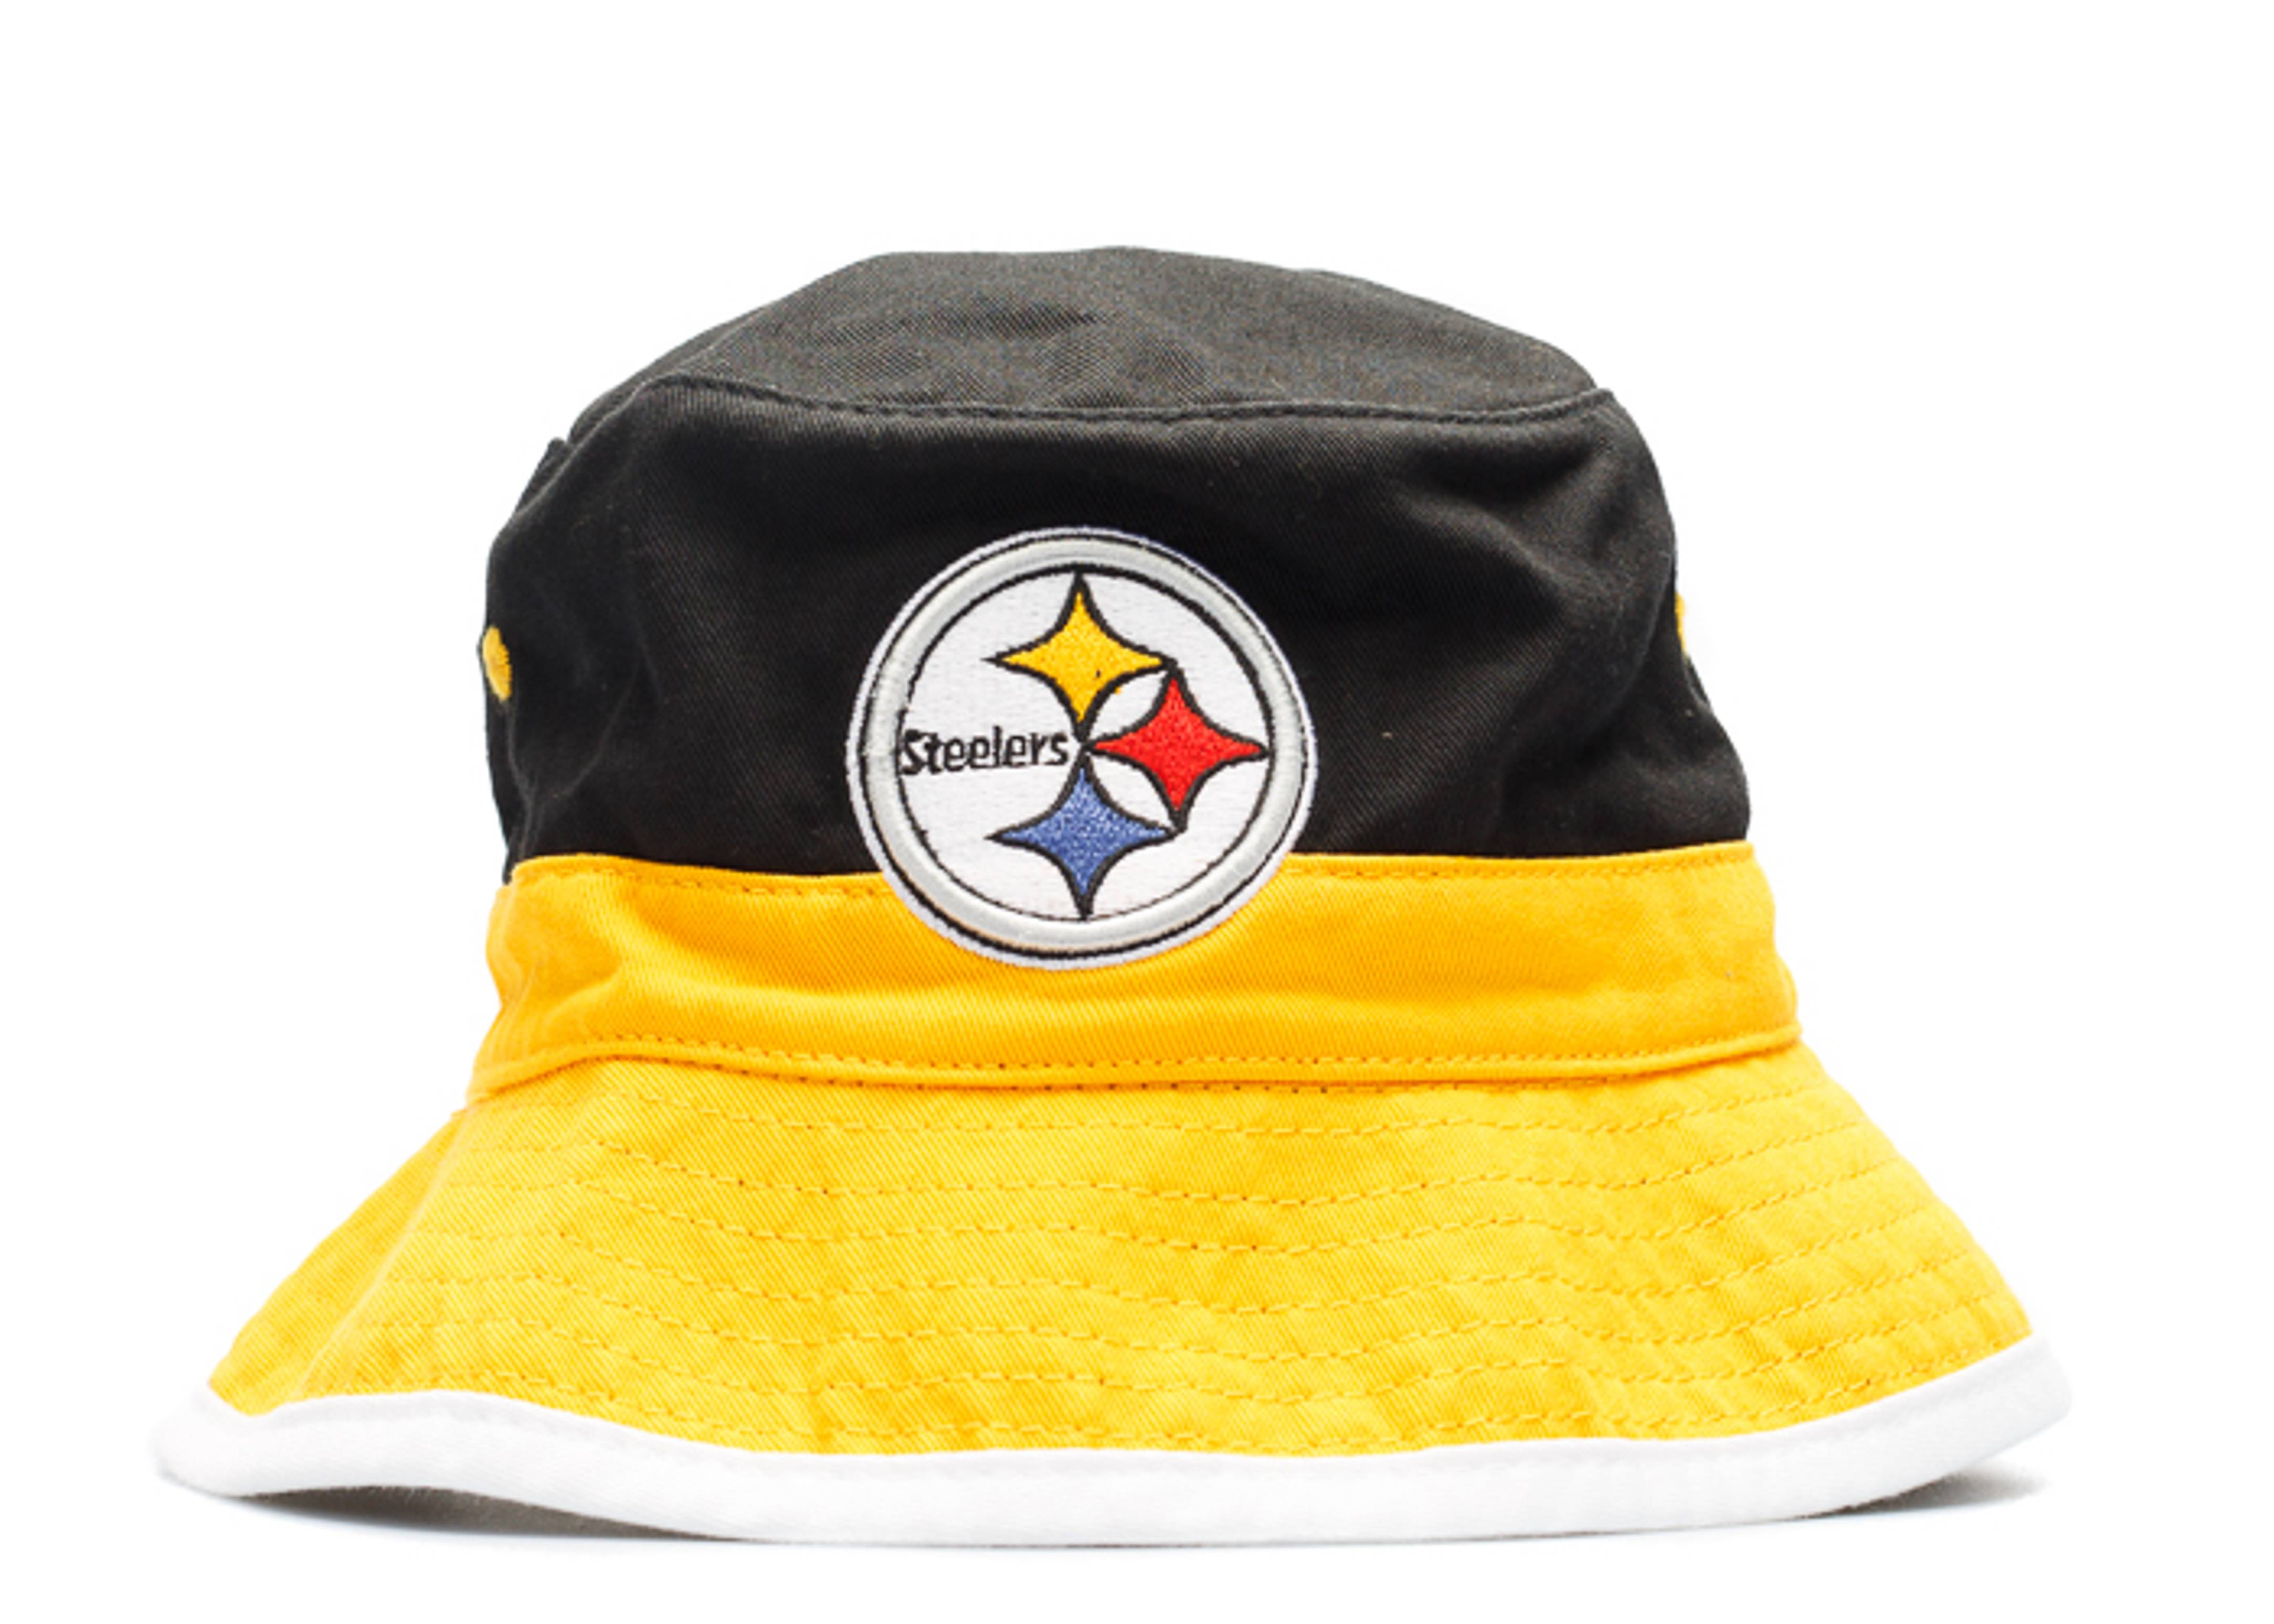 c7f3f8dd6ef Pittsburgh Steelers Bucket Hat - Mitchell   Ness - u131mtc6steel ...